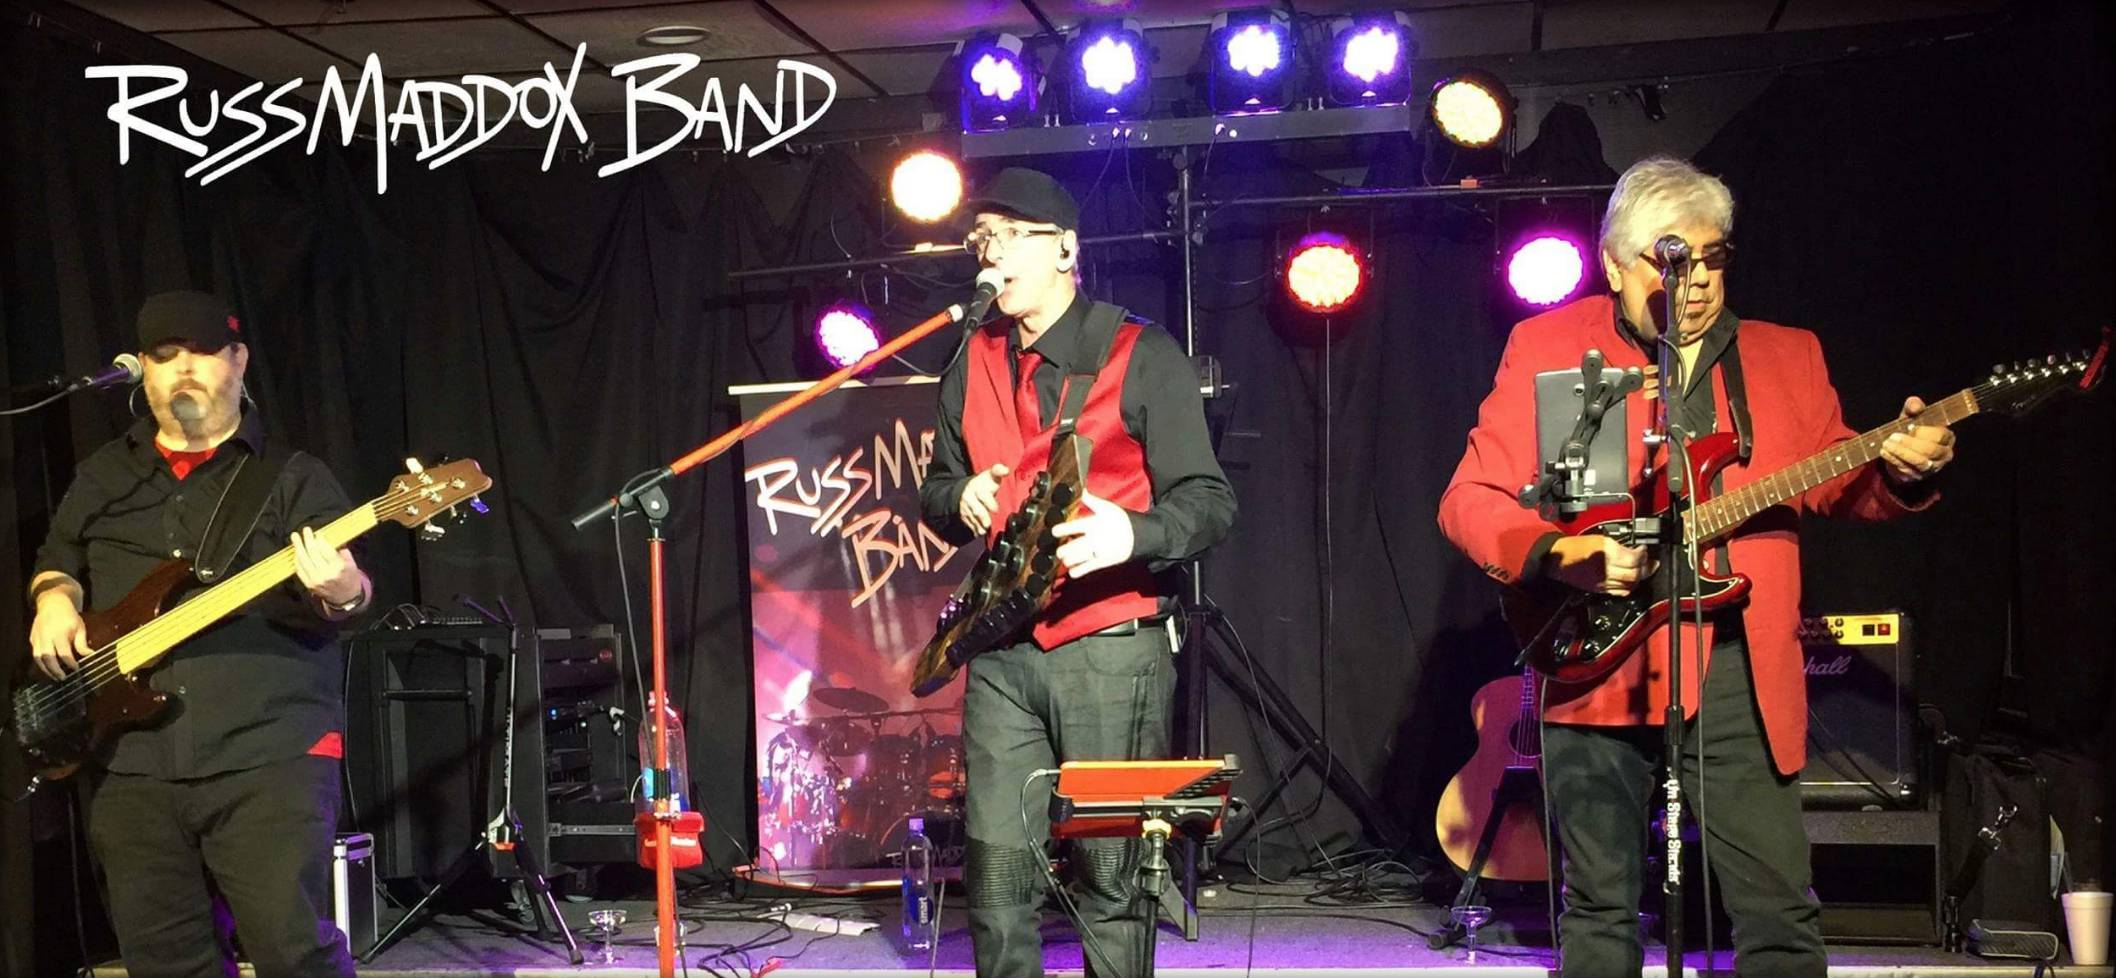 Live Music w/ Russ Maddox Band